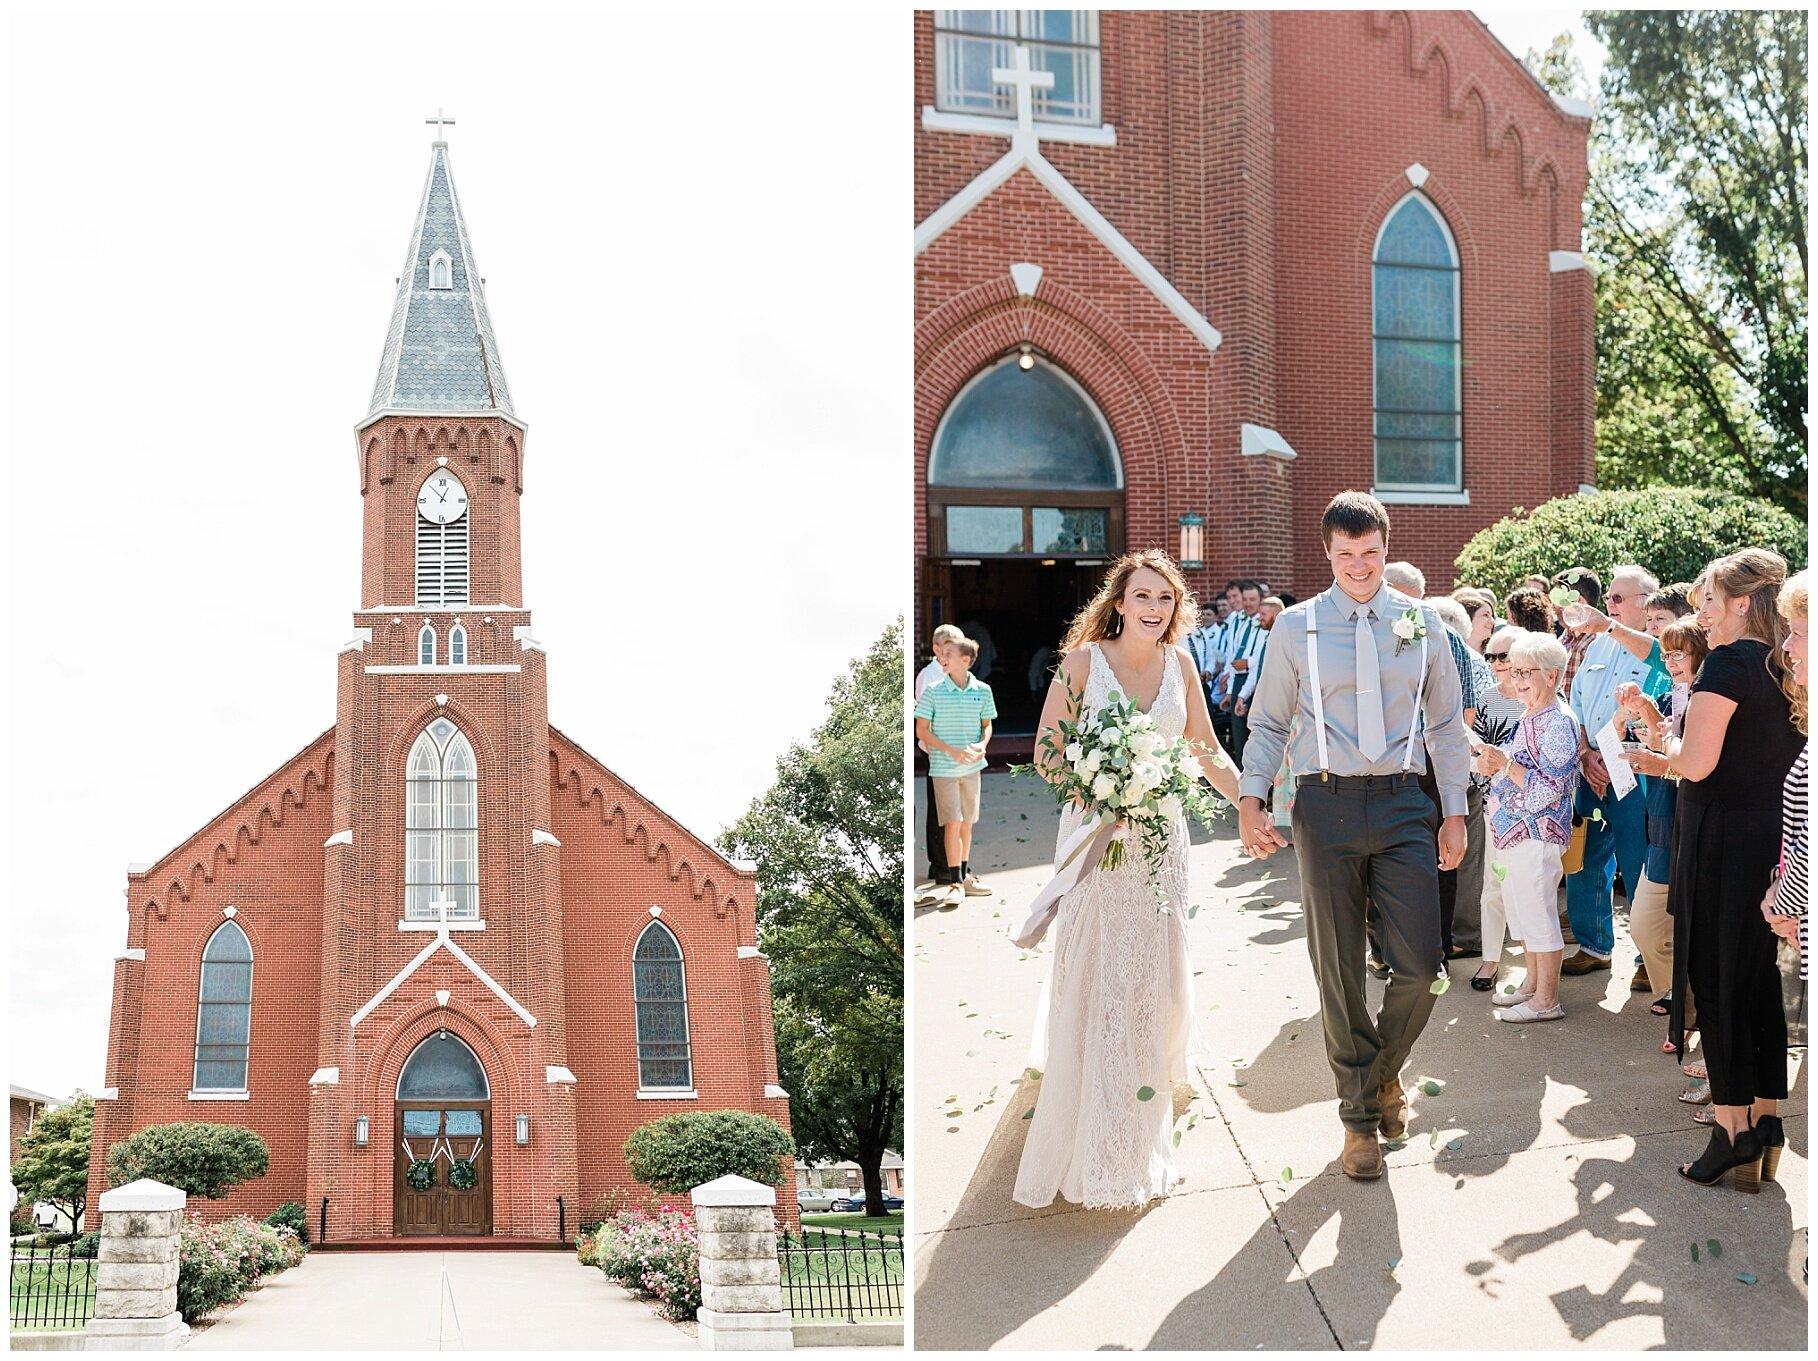 Earth-Toned Wedding by KKP Associate Wedding Photographer and Kelsi Kliethermes Photography Best Columbia Missouri Wedding Photographer_0033.jpg